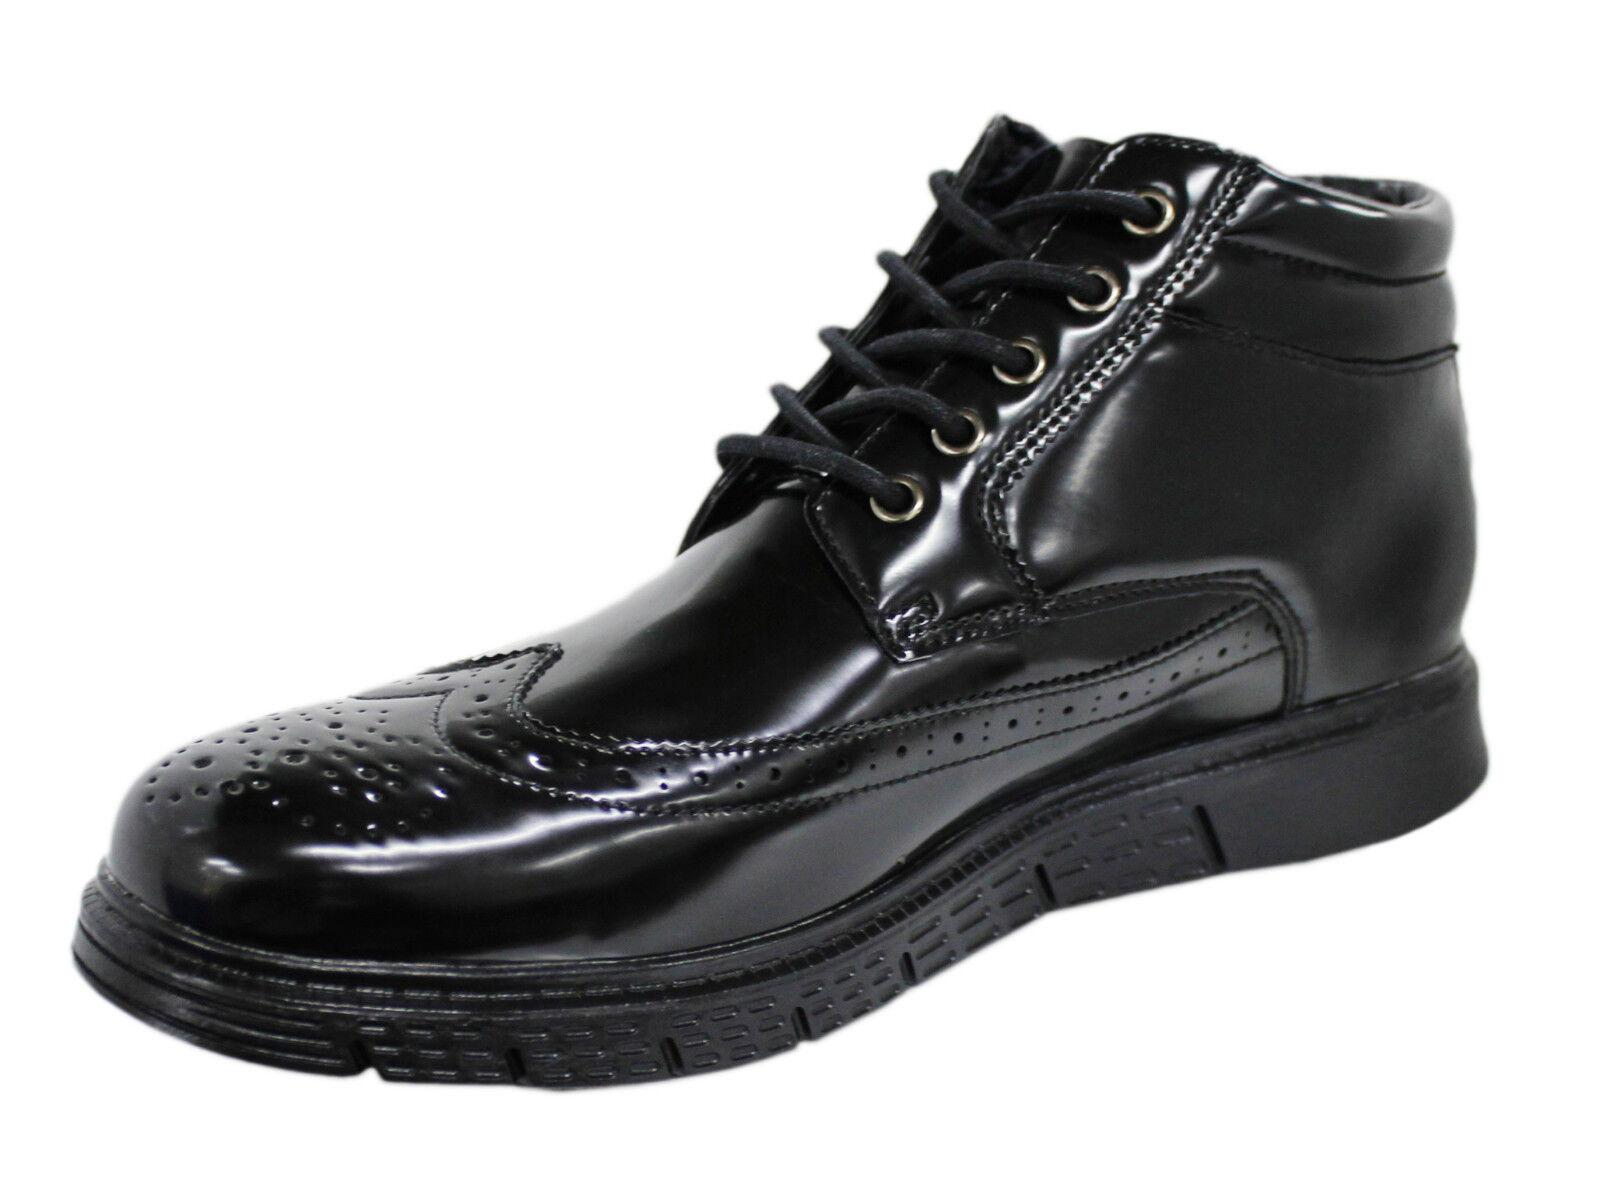 SHOES ENGLISHWOMEN MAN CLASS CASUAL BLACK BOOTIES SNEAKERS WINTER CASUAL CLASS 0b1af3